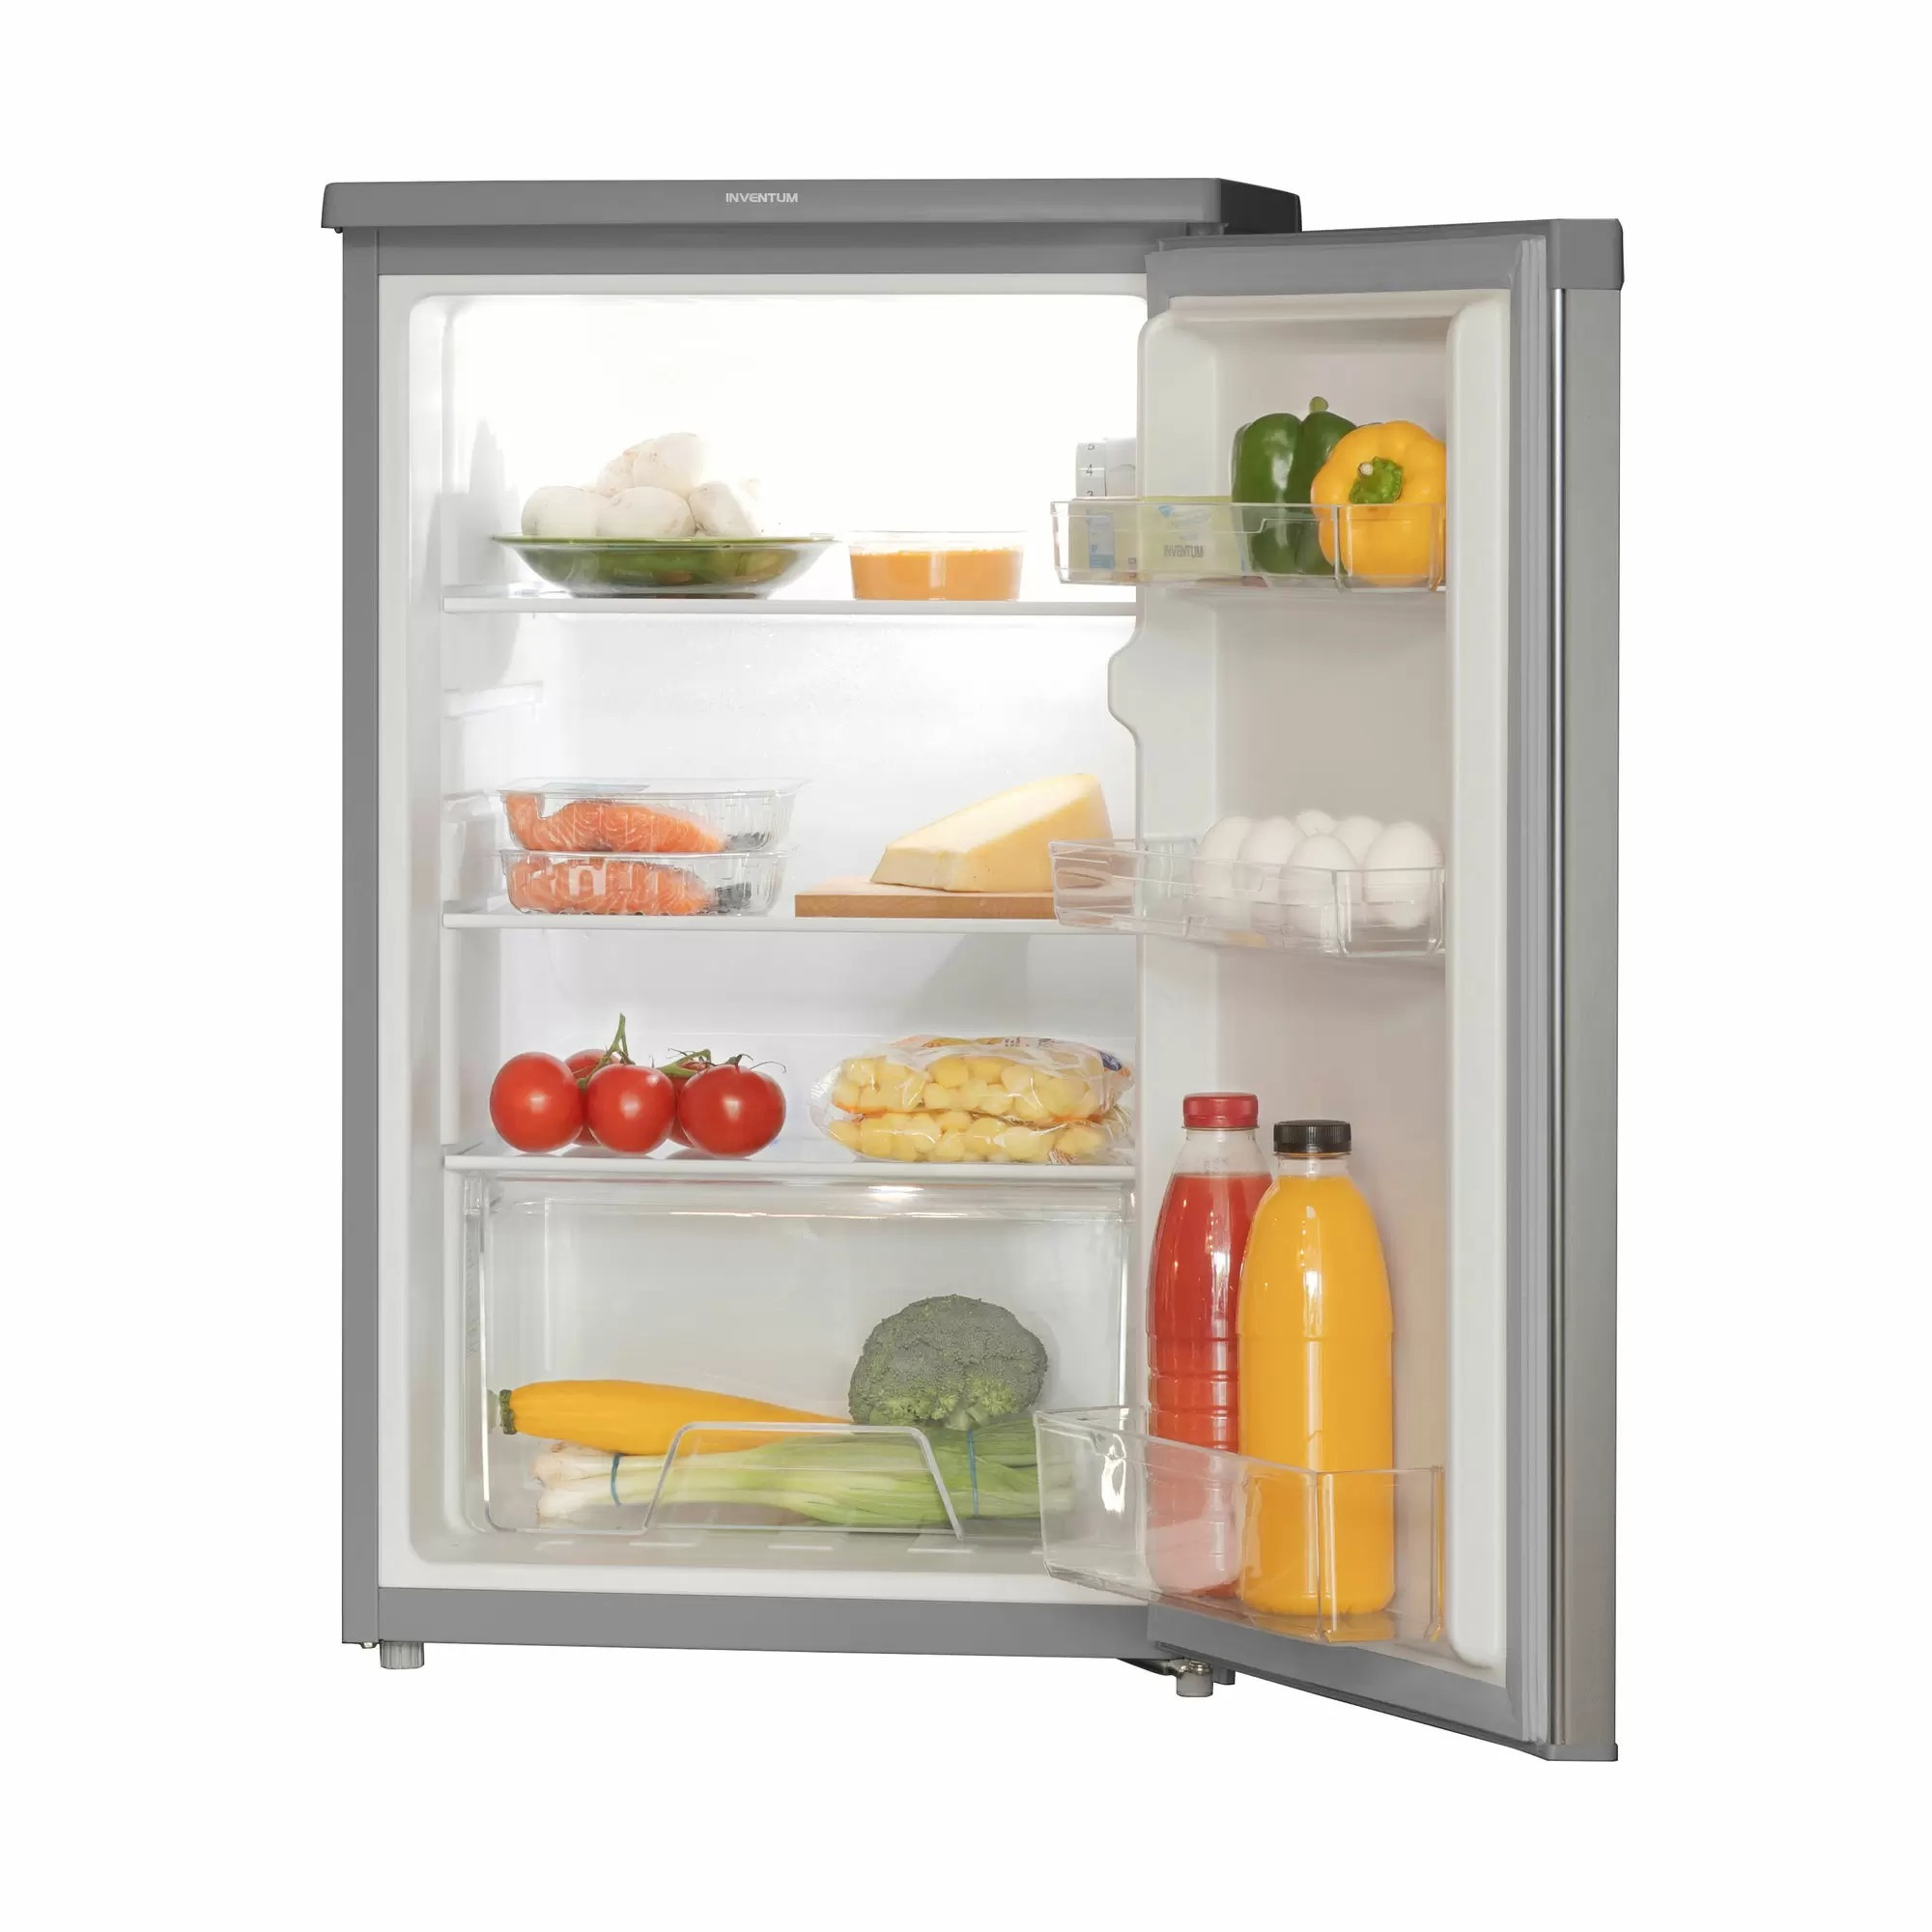 Korting Inventum KK055R koelkast zonder vriesvak